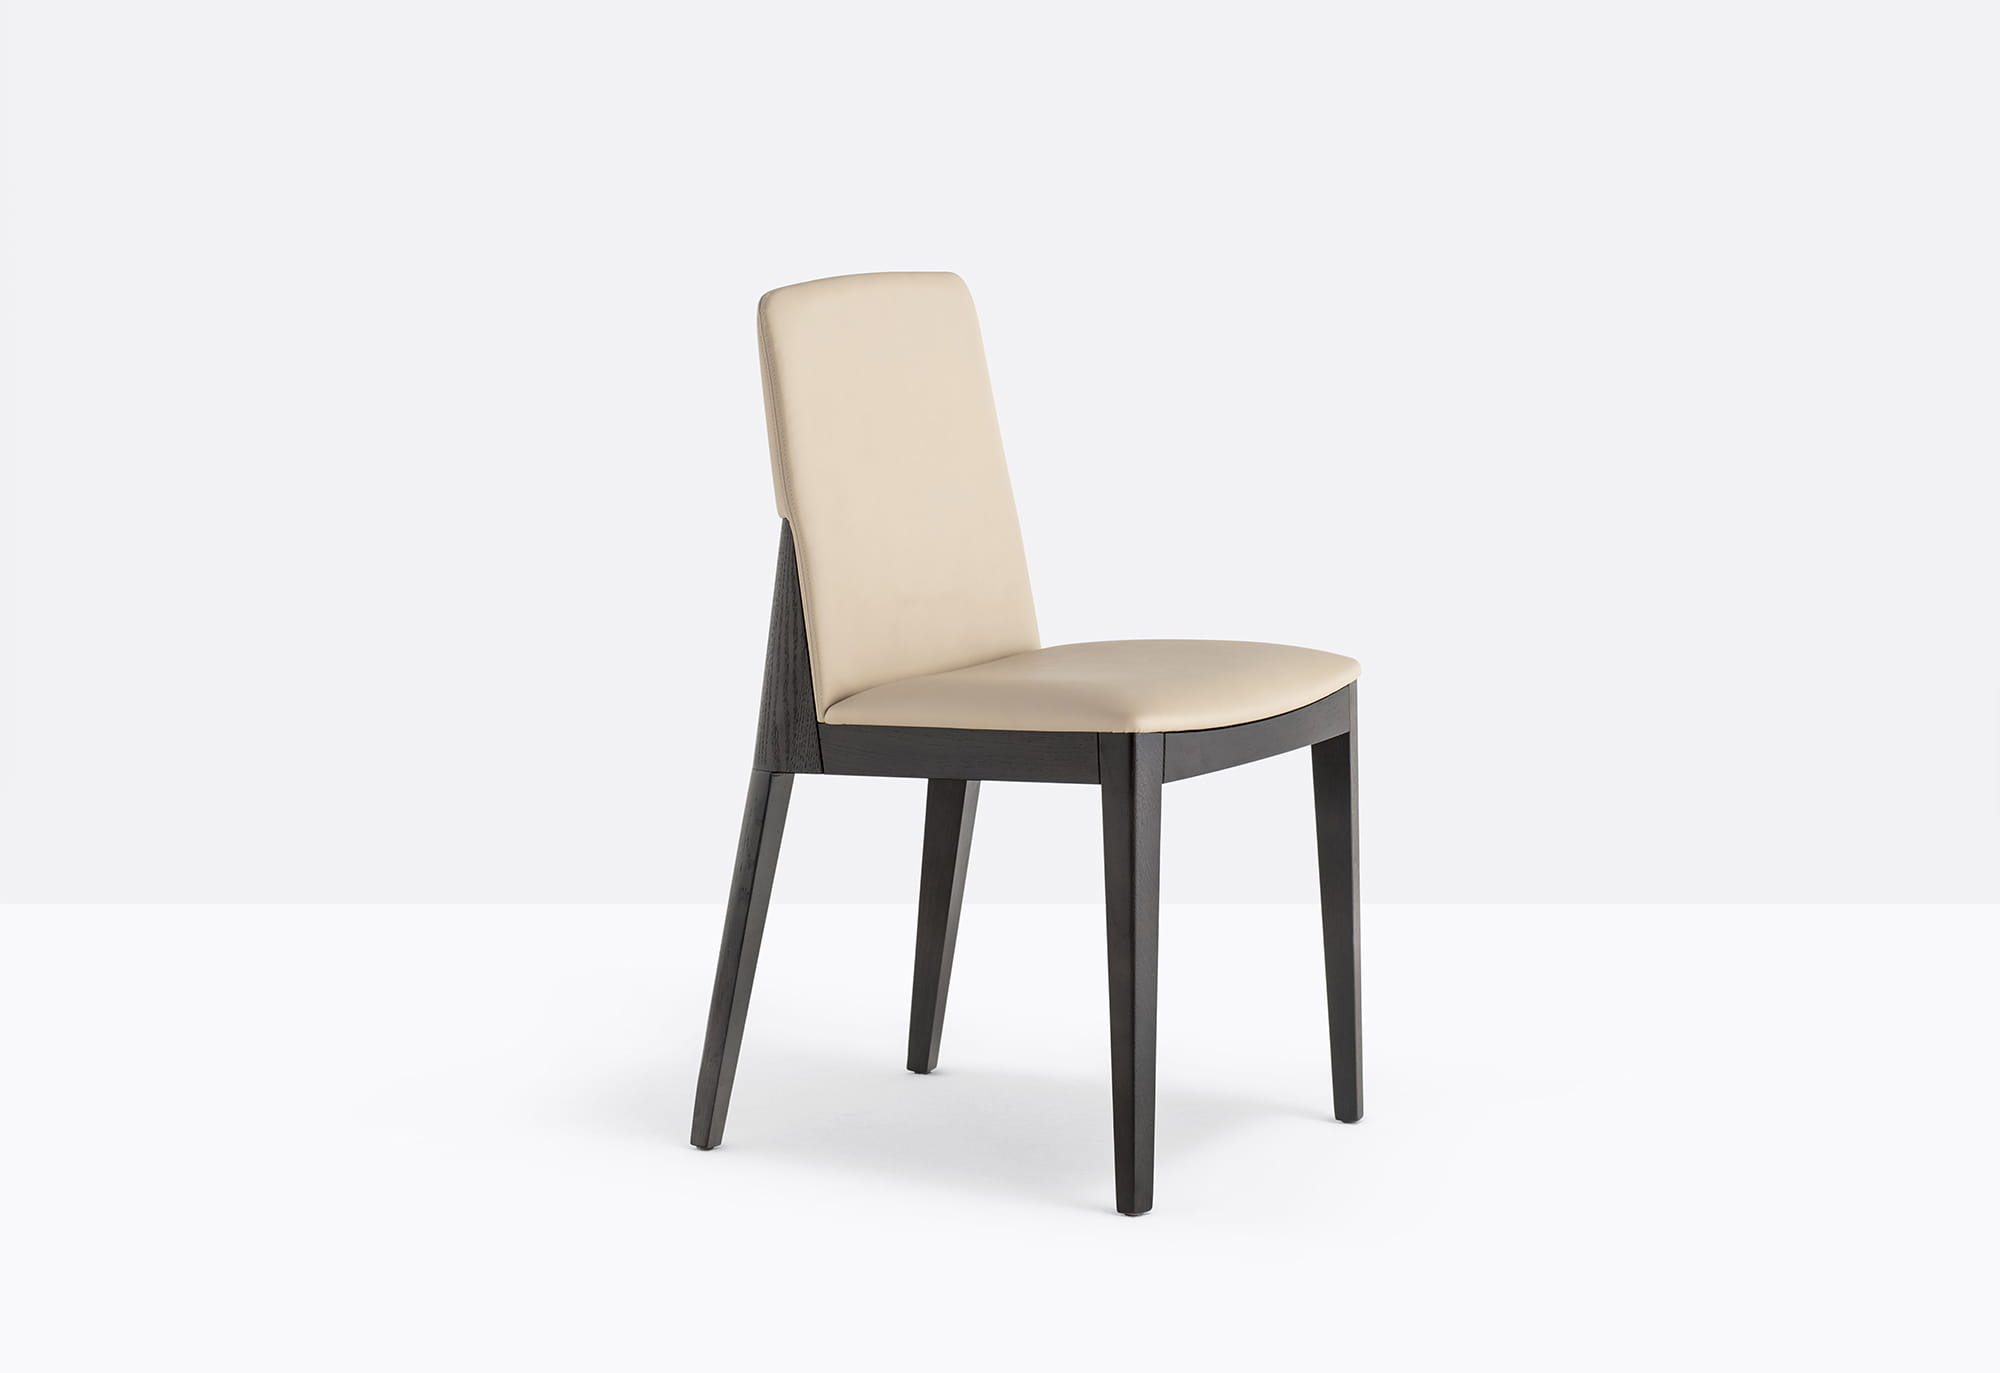 Pedrali Krzesło Allure 735 BI Biały